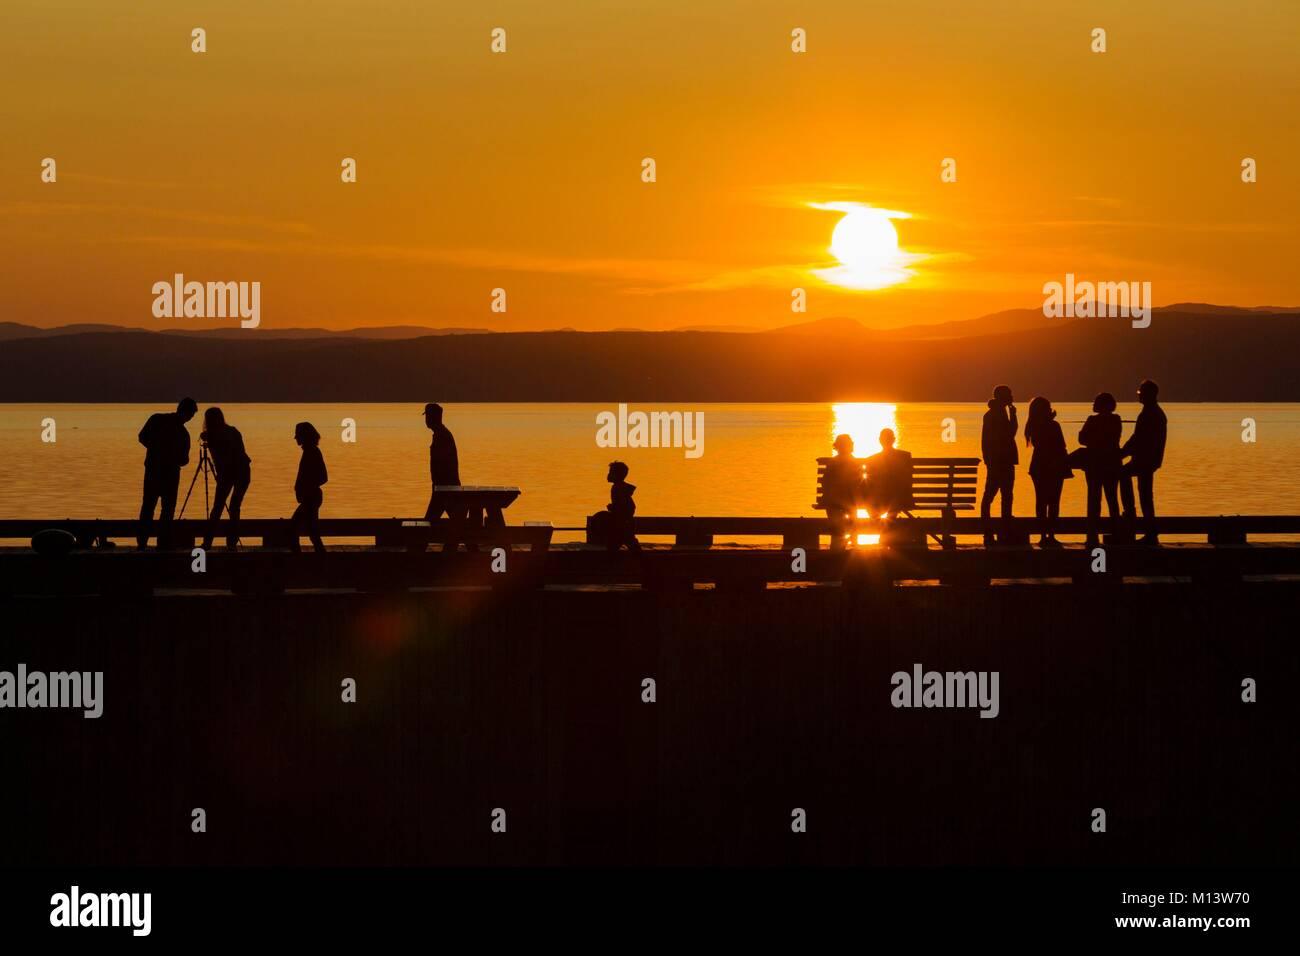 Canada, province of Quebec, Bas-Saint-Laurent region, Kamouraska, Miller quay at sunset, shadows - Stock Image